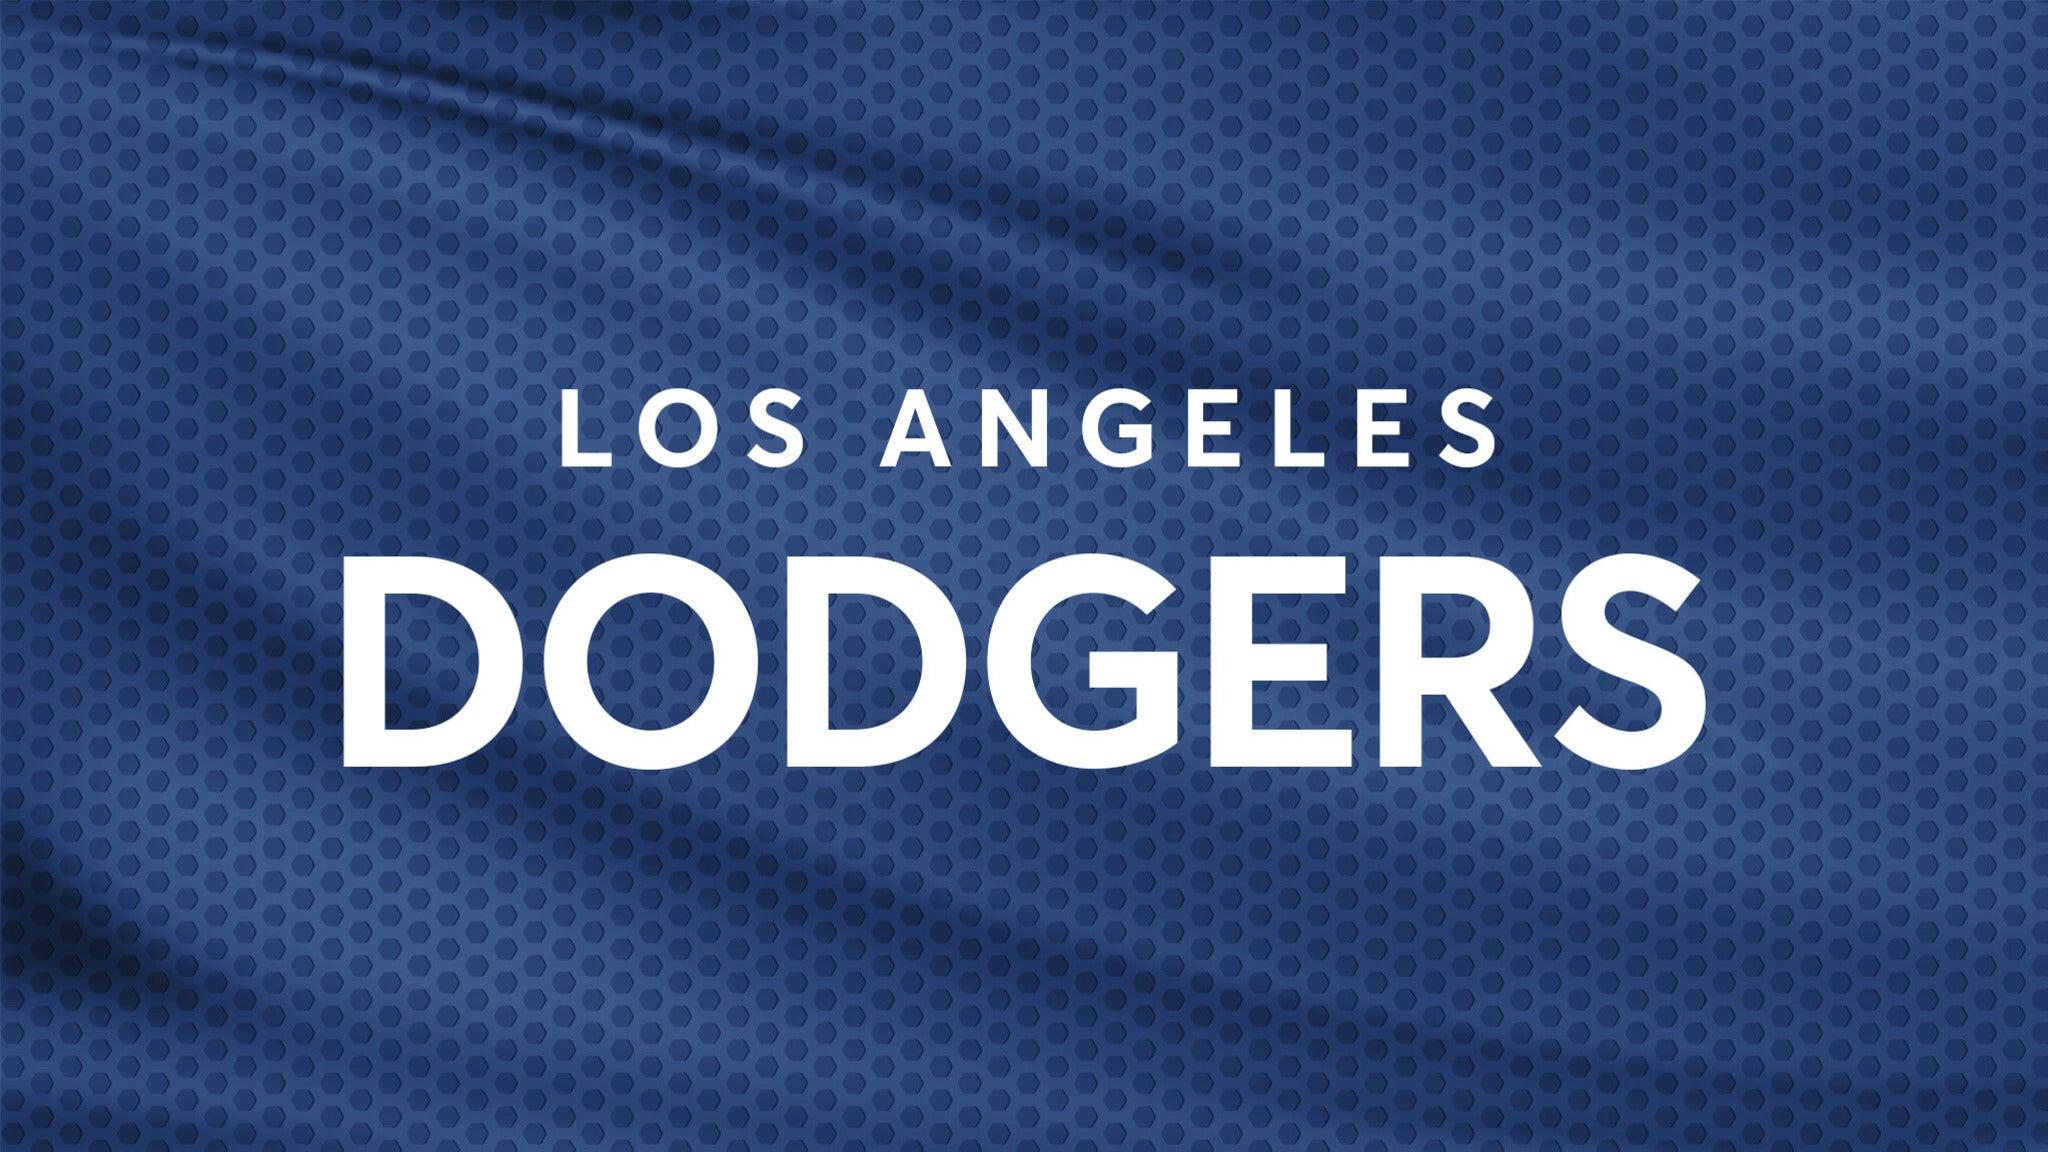 Los Angeles Dodgers vs. Seattle Mariners